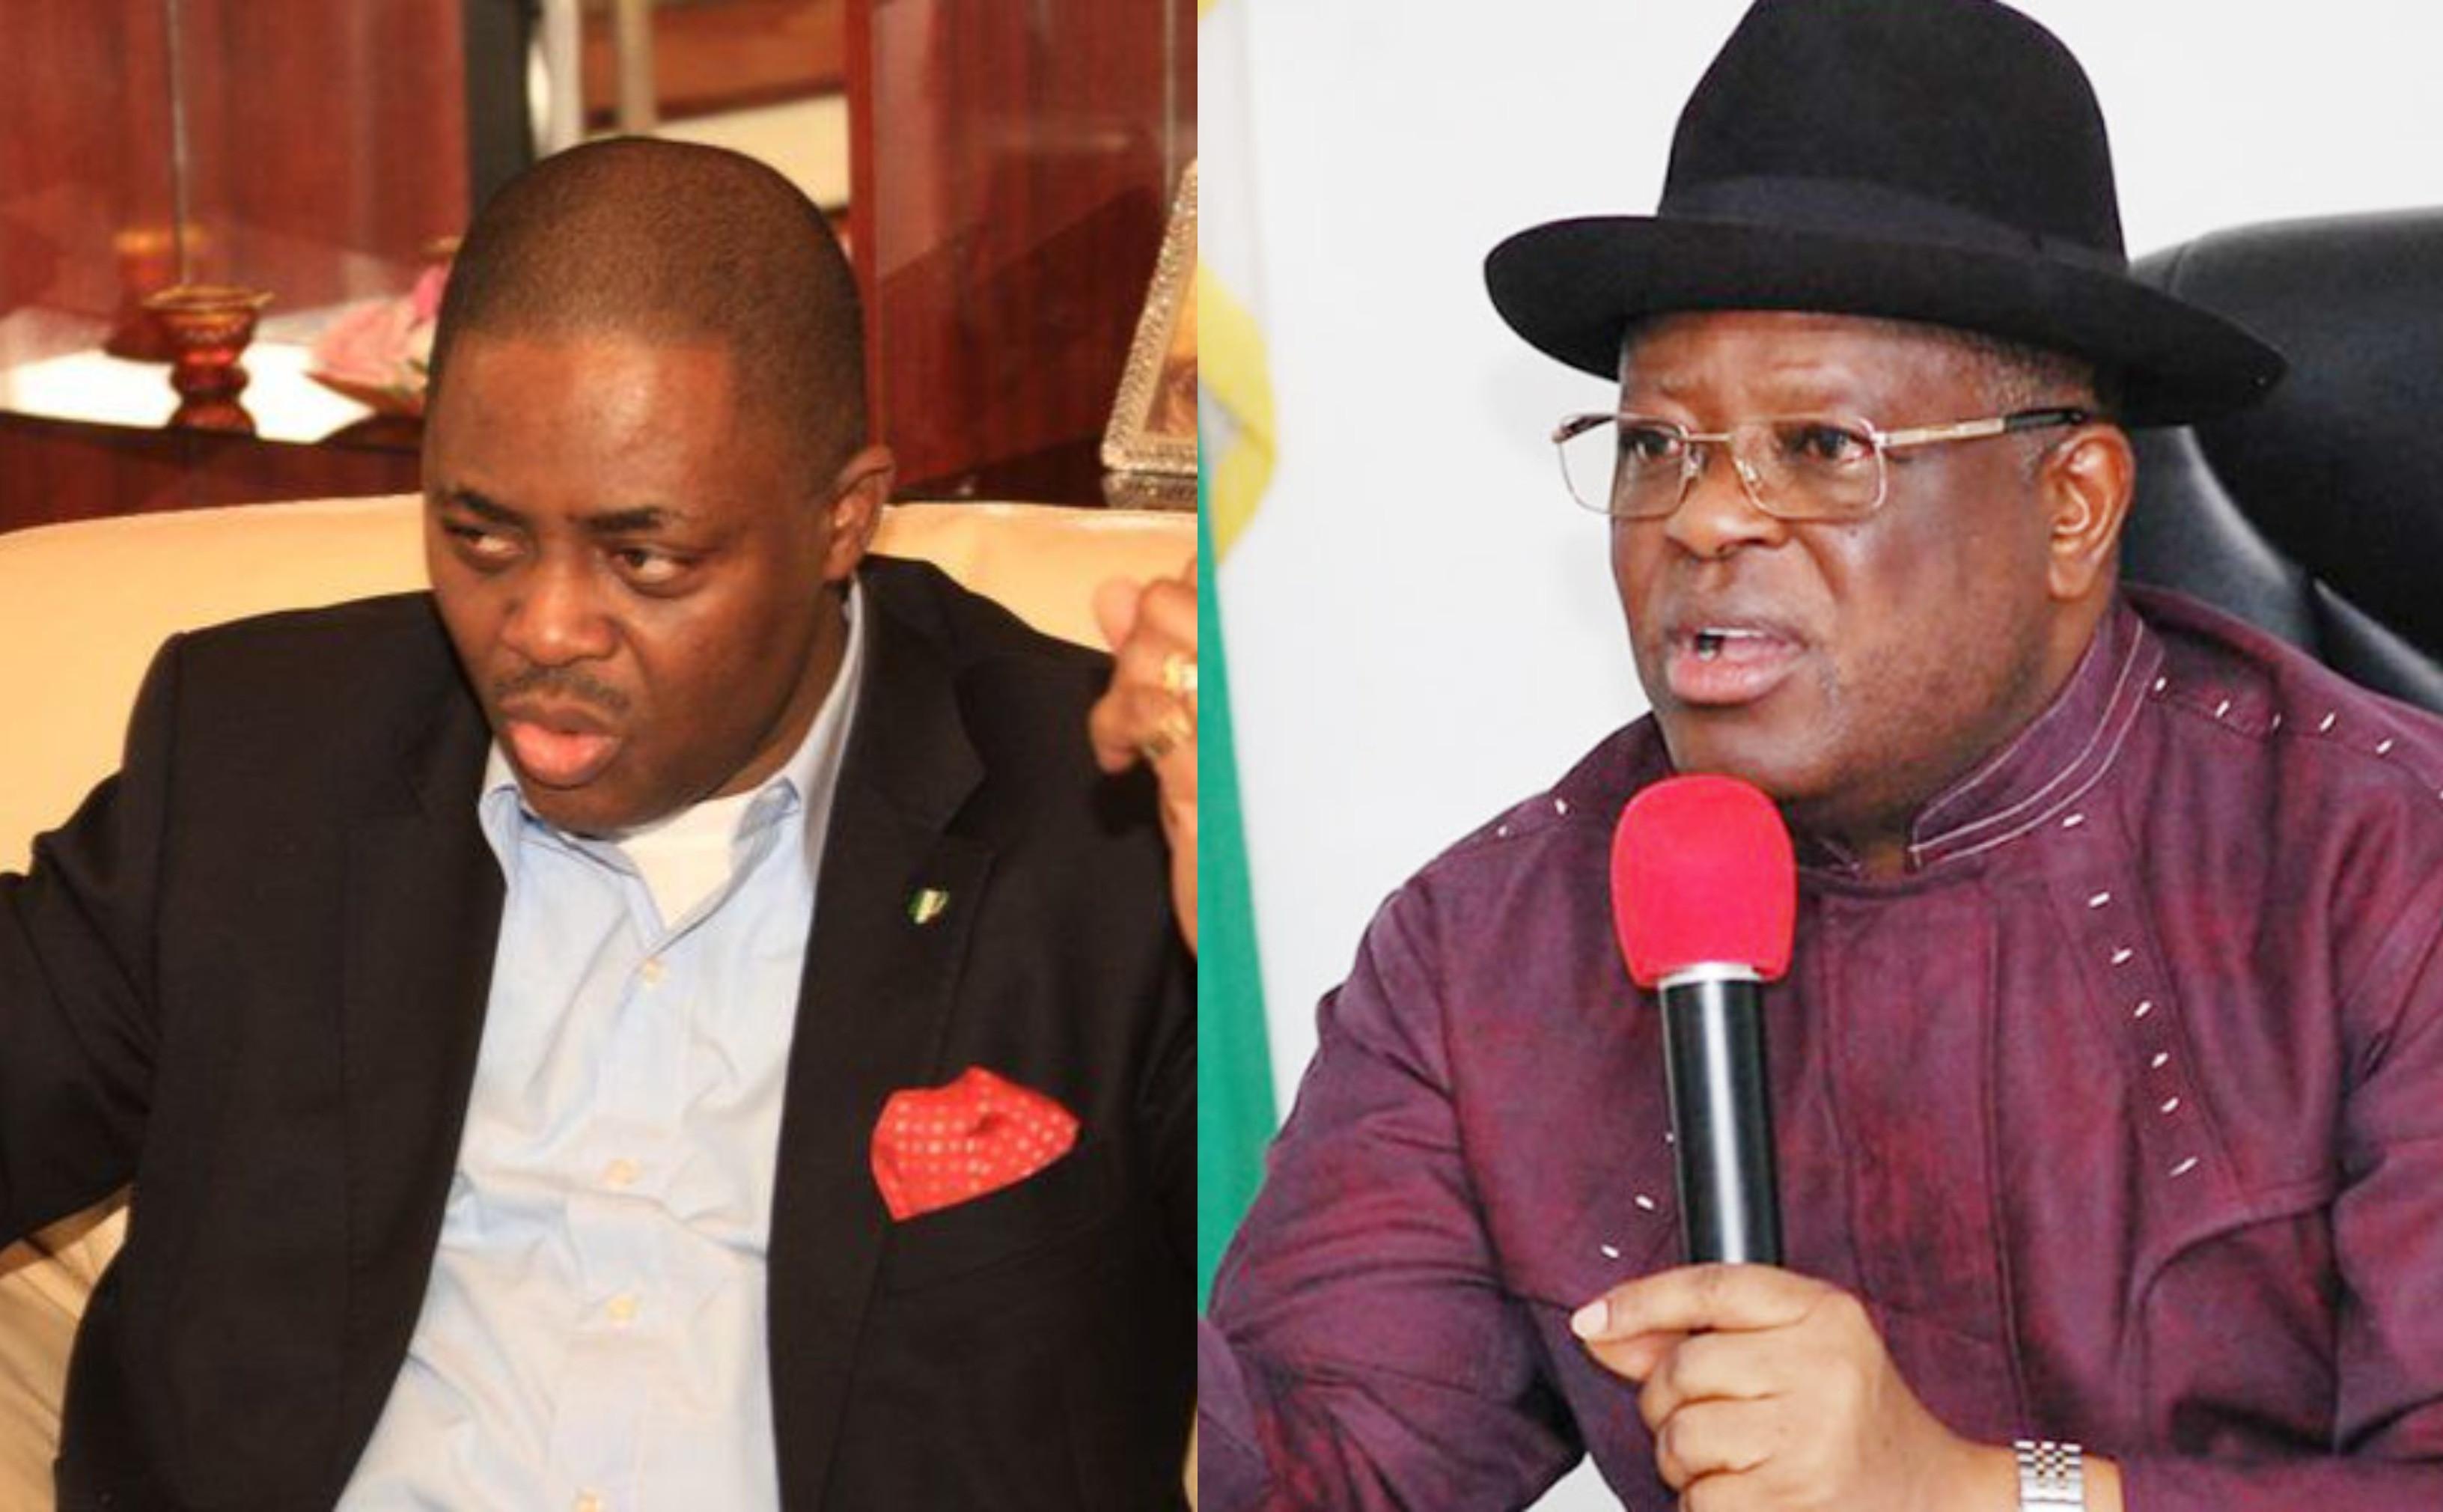 Rumour of Governor David Umahi planning to leave PDP for APC is troubling - FFK lindaikejisblog